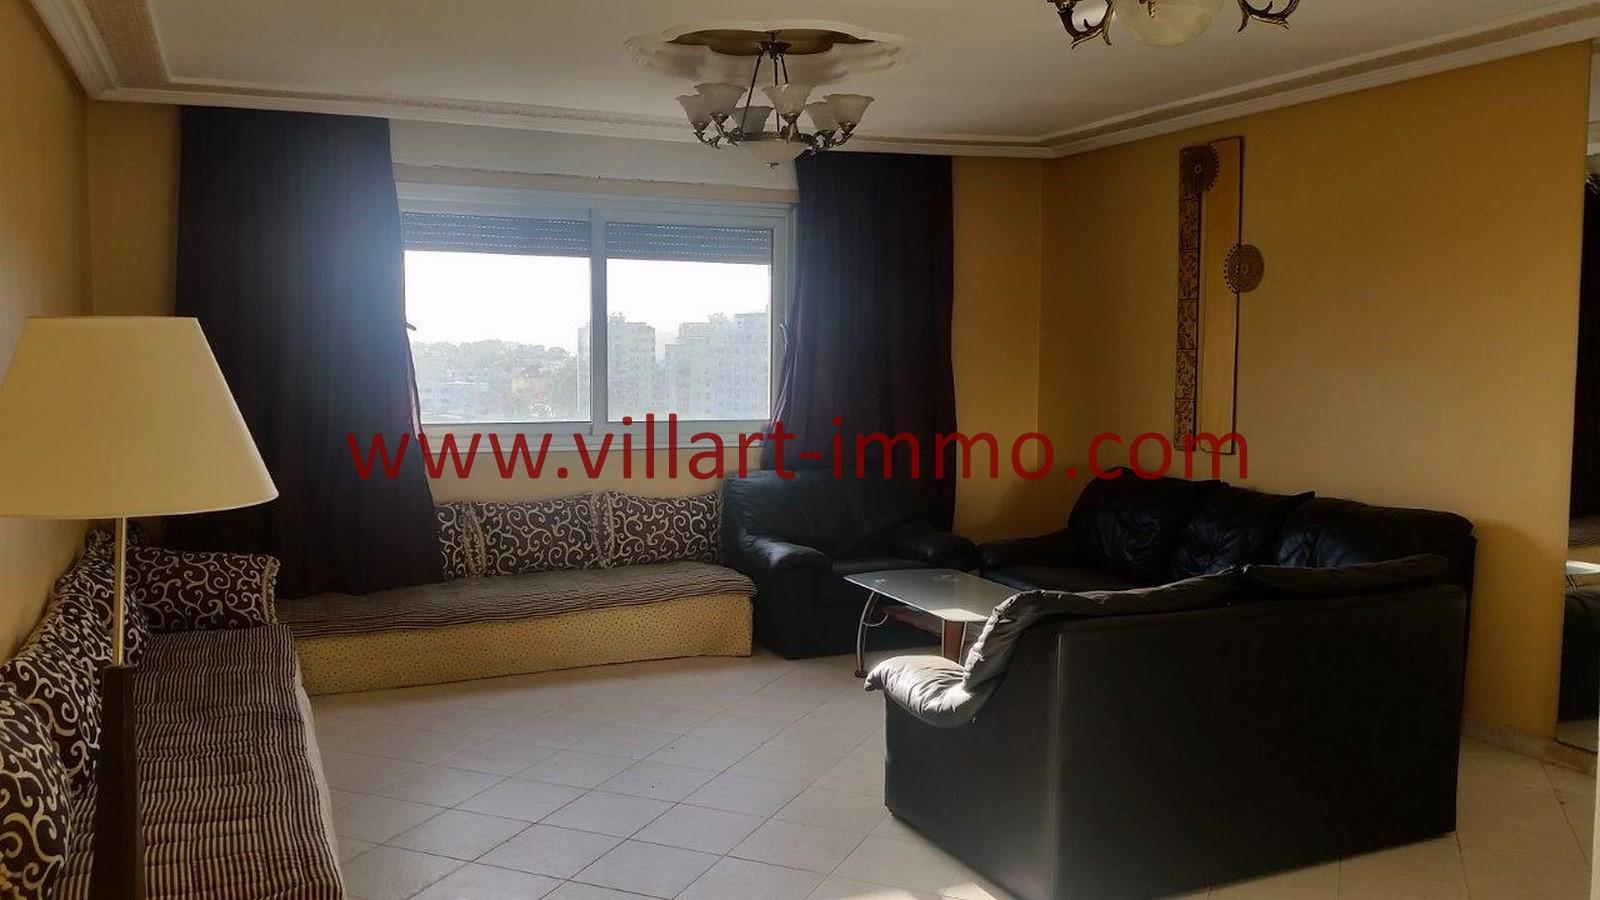 1-location-Appartement-Meuble-Tanger-Iberia-Salon 1-l1012-villart-immo-maroc